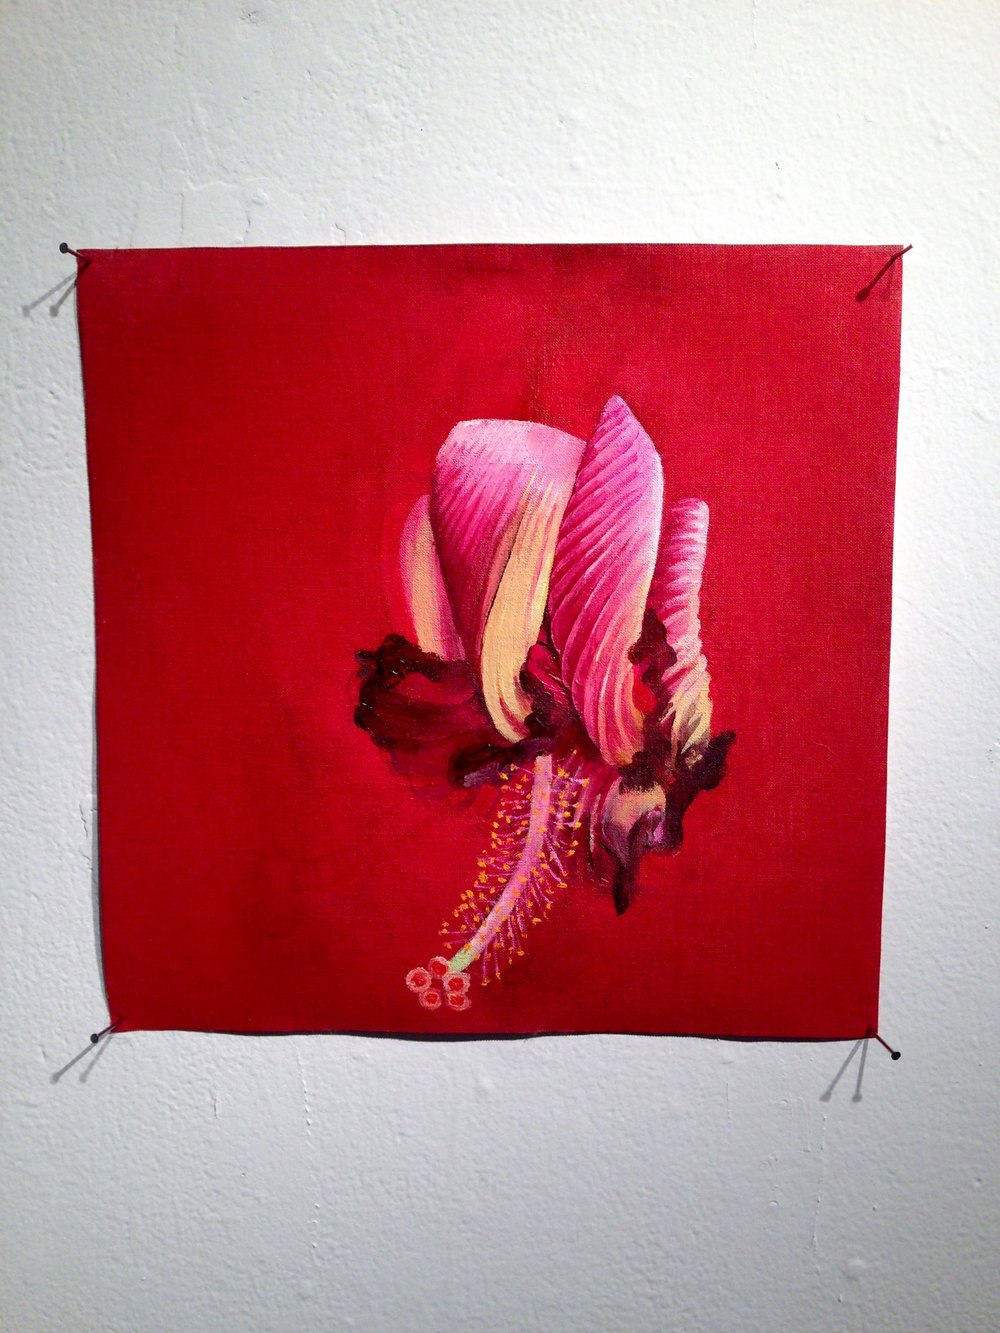 Spent Hibiscus no. 2, Katherine Rutecki, 2015